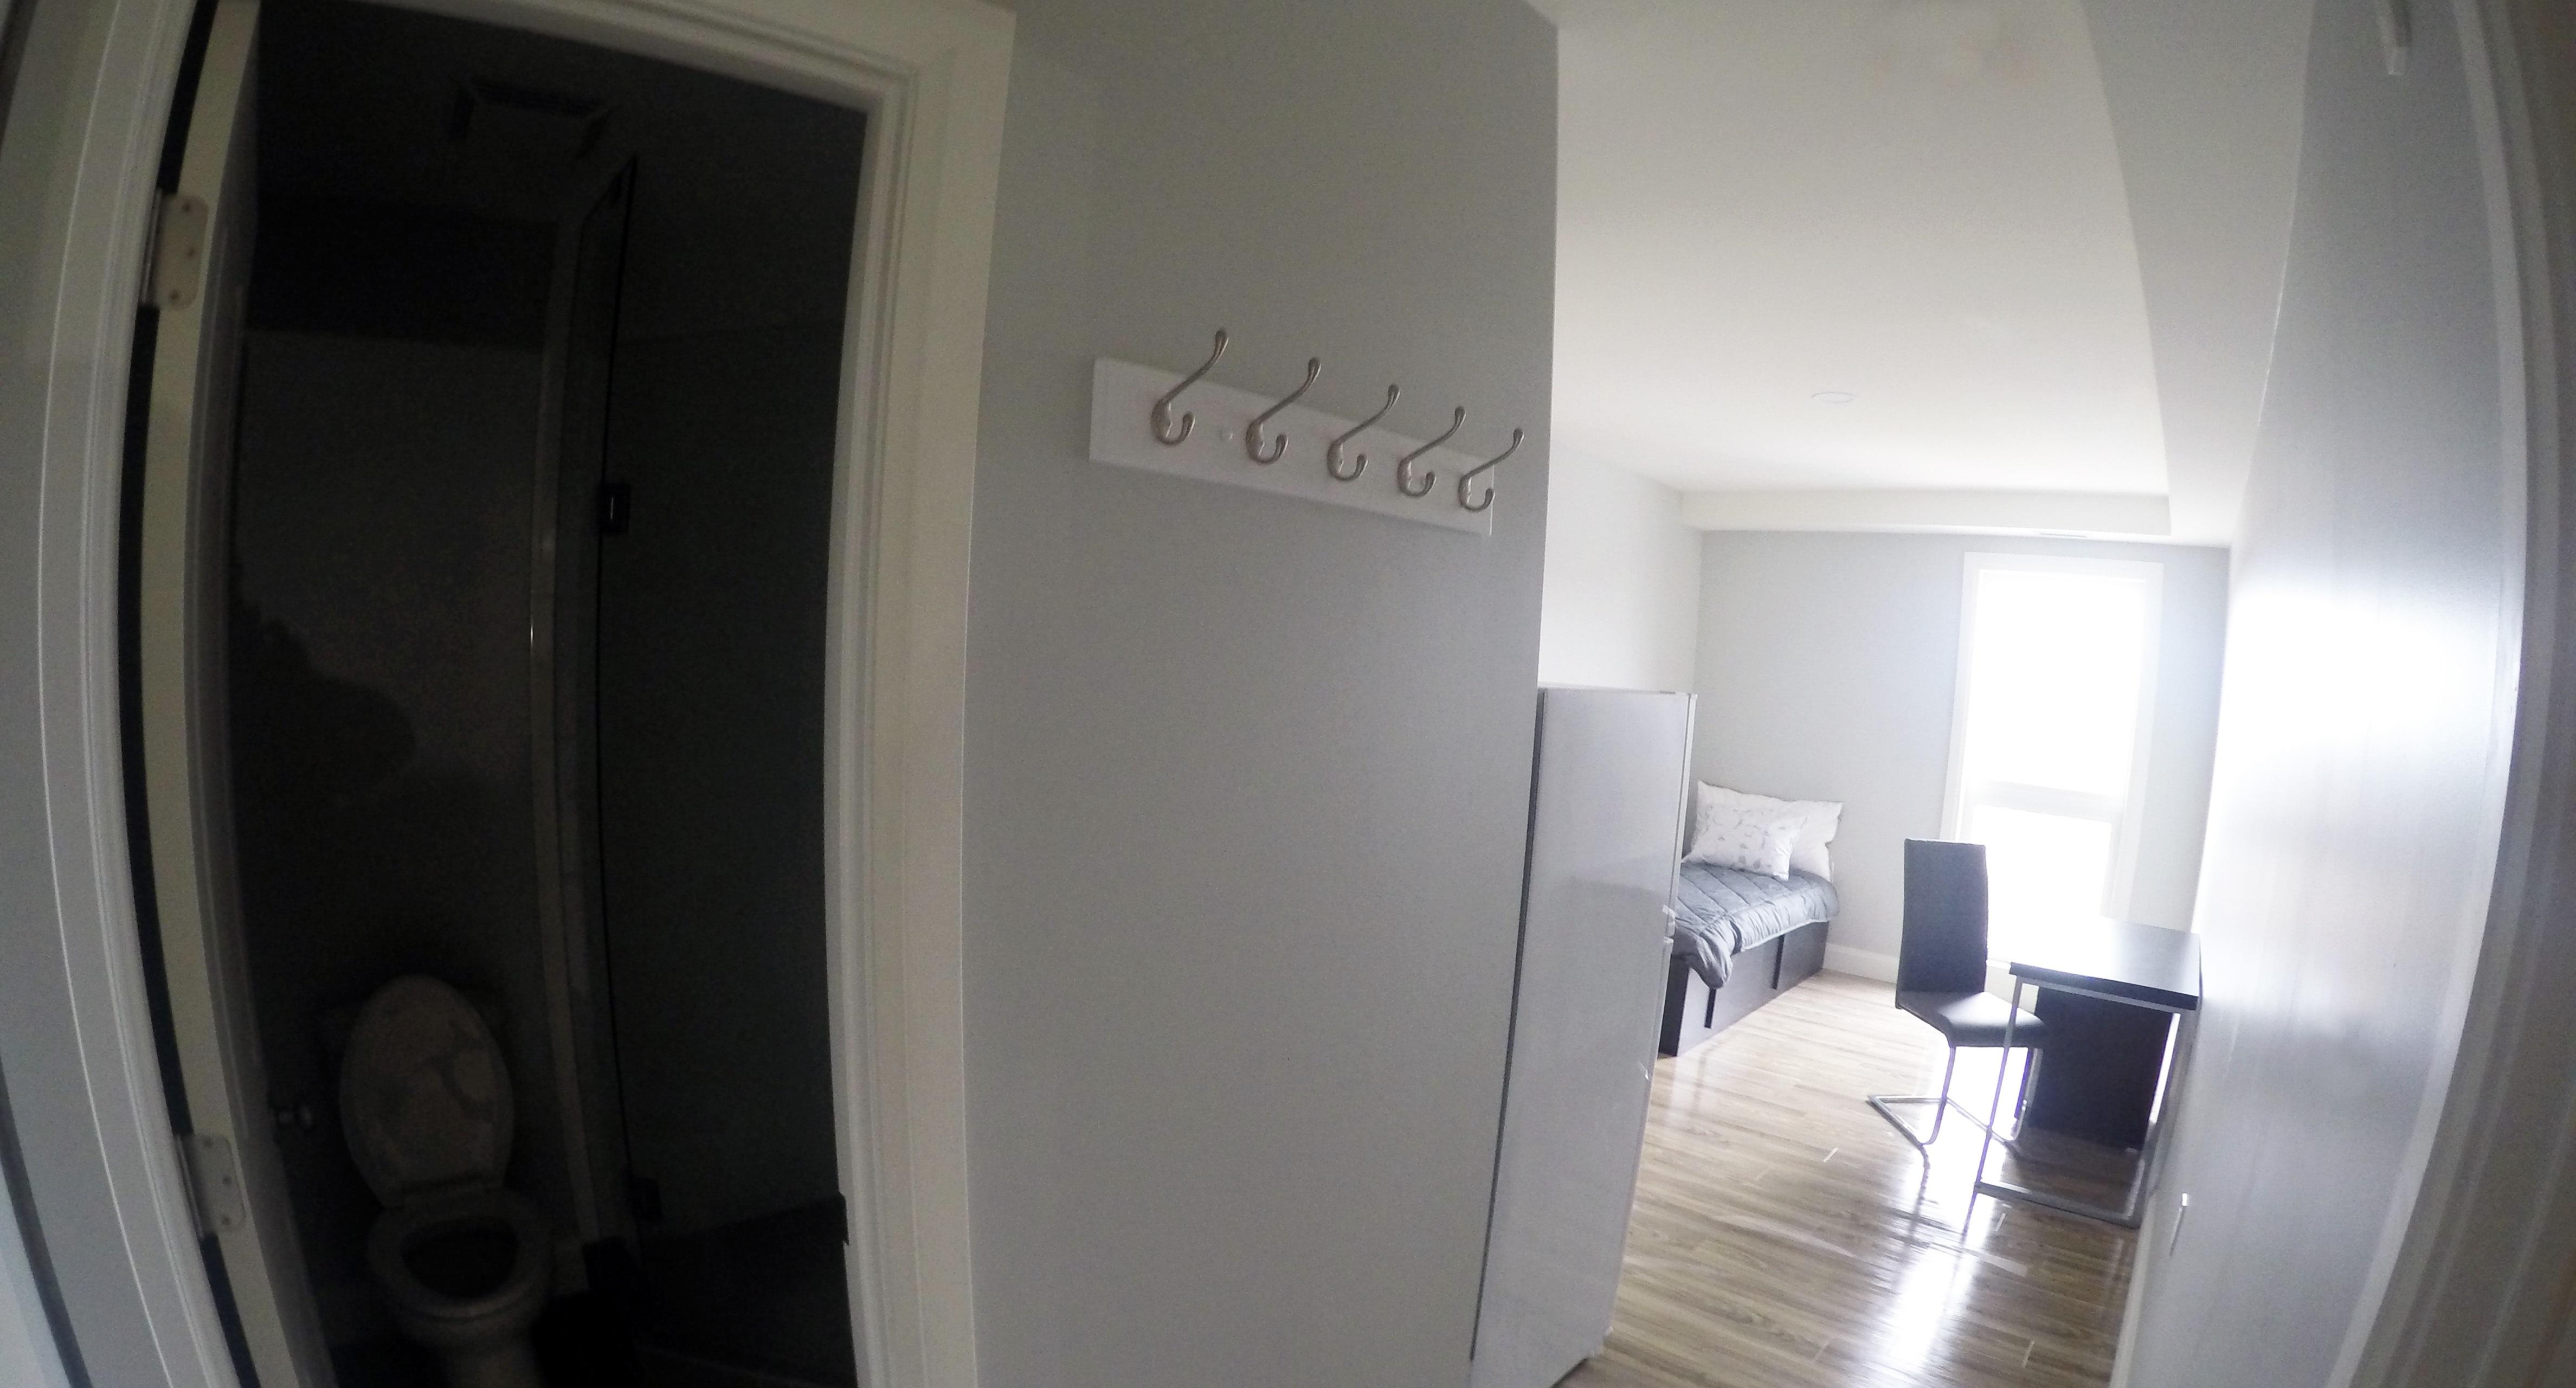 Bedroom_Full_GoPro_unbranded